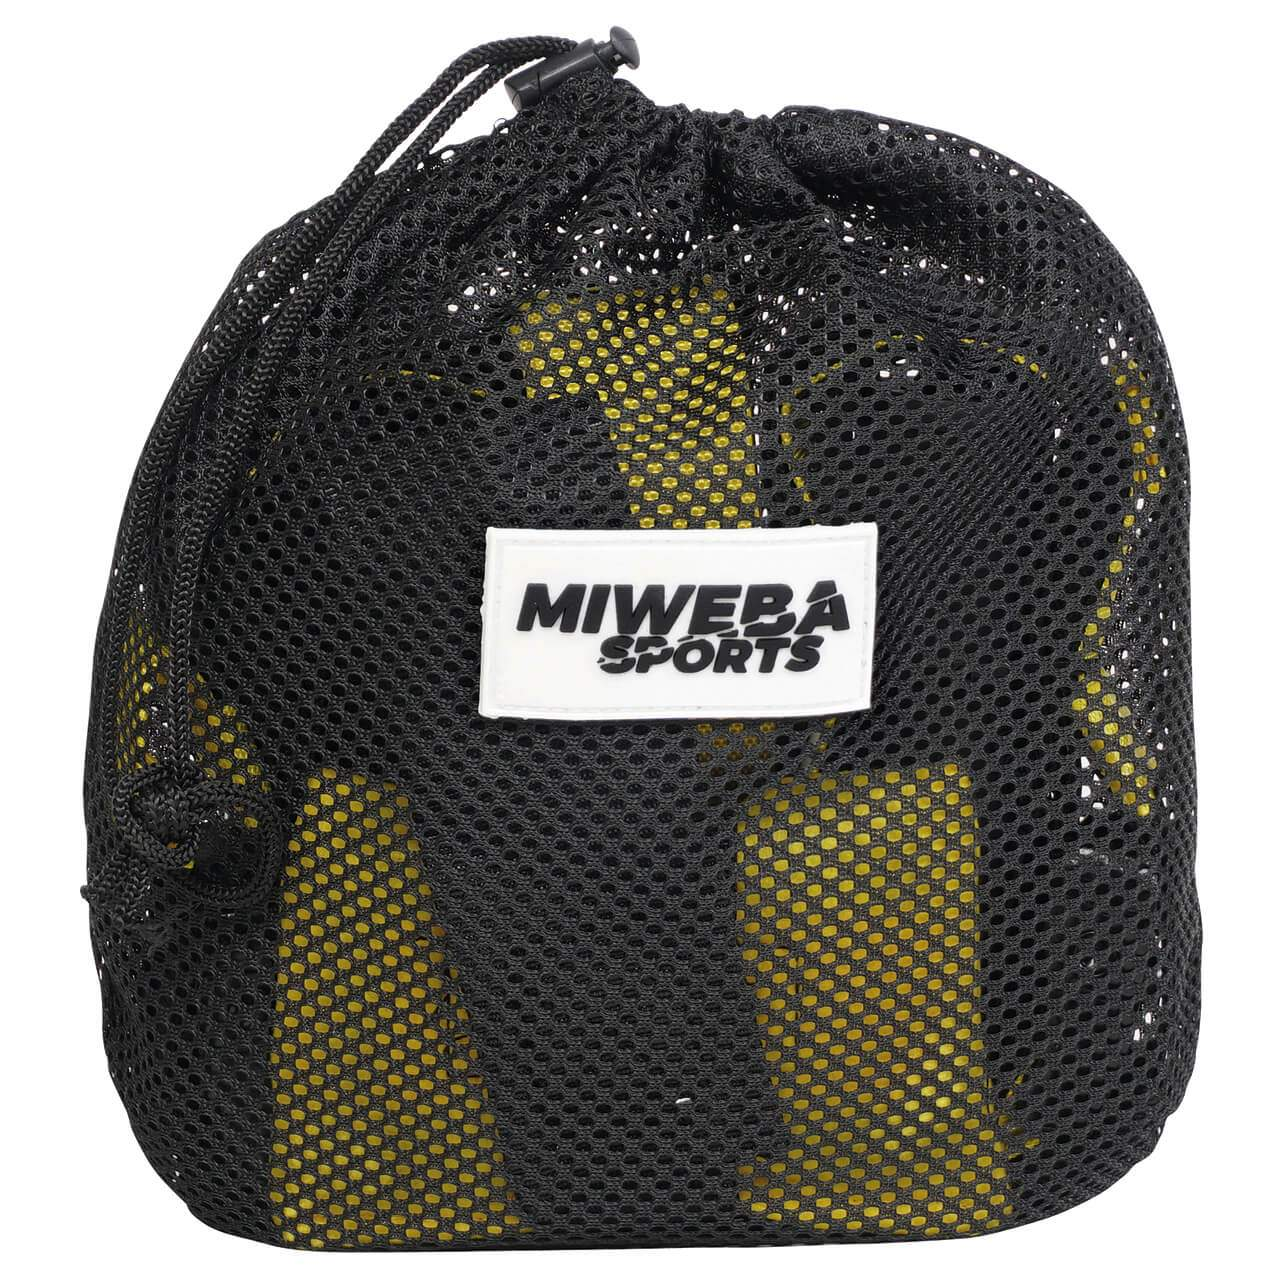 Miweba Sports Schlingentrainer Suspensiontrainer